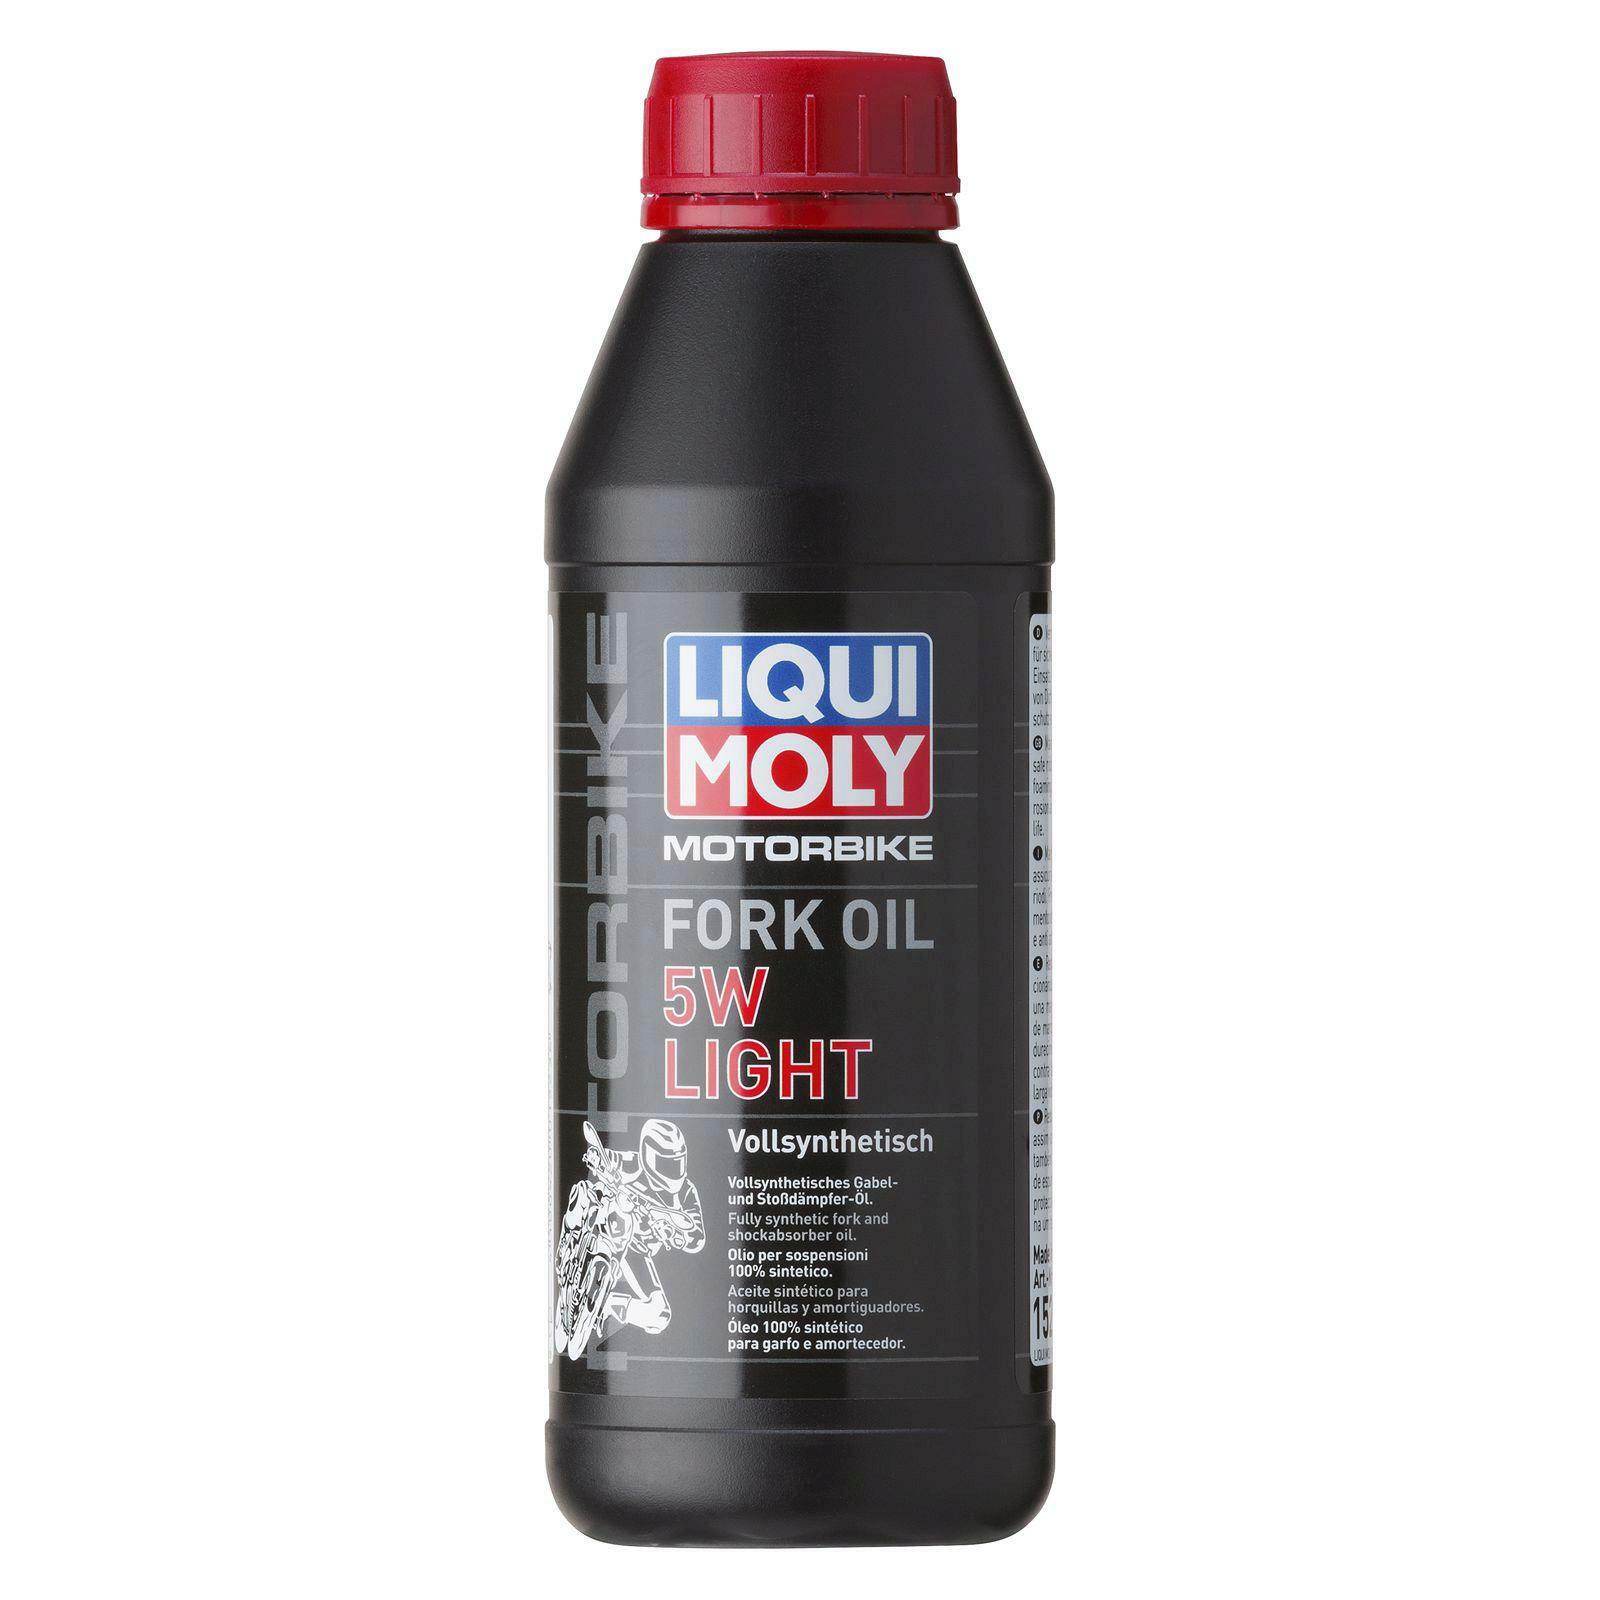 Liqui Moly Motorbike Fork Öl 5W light 500ml